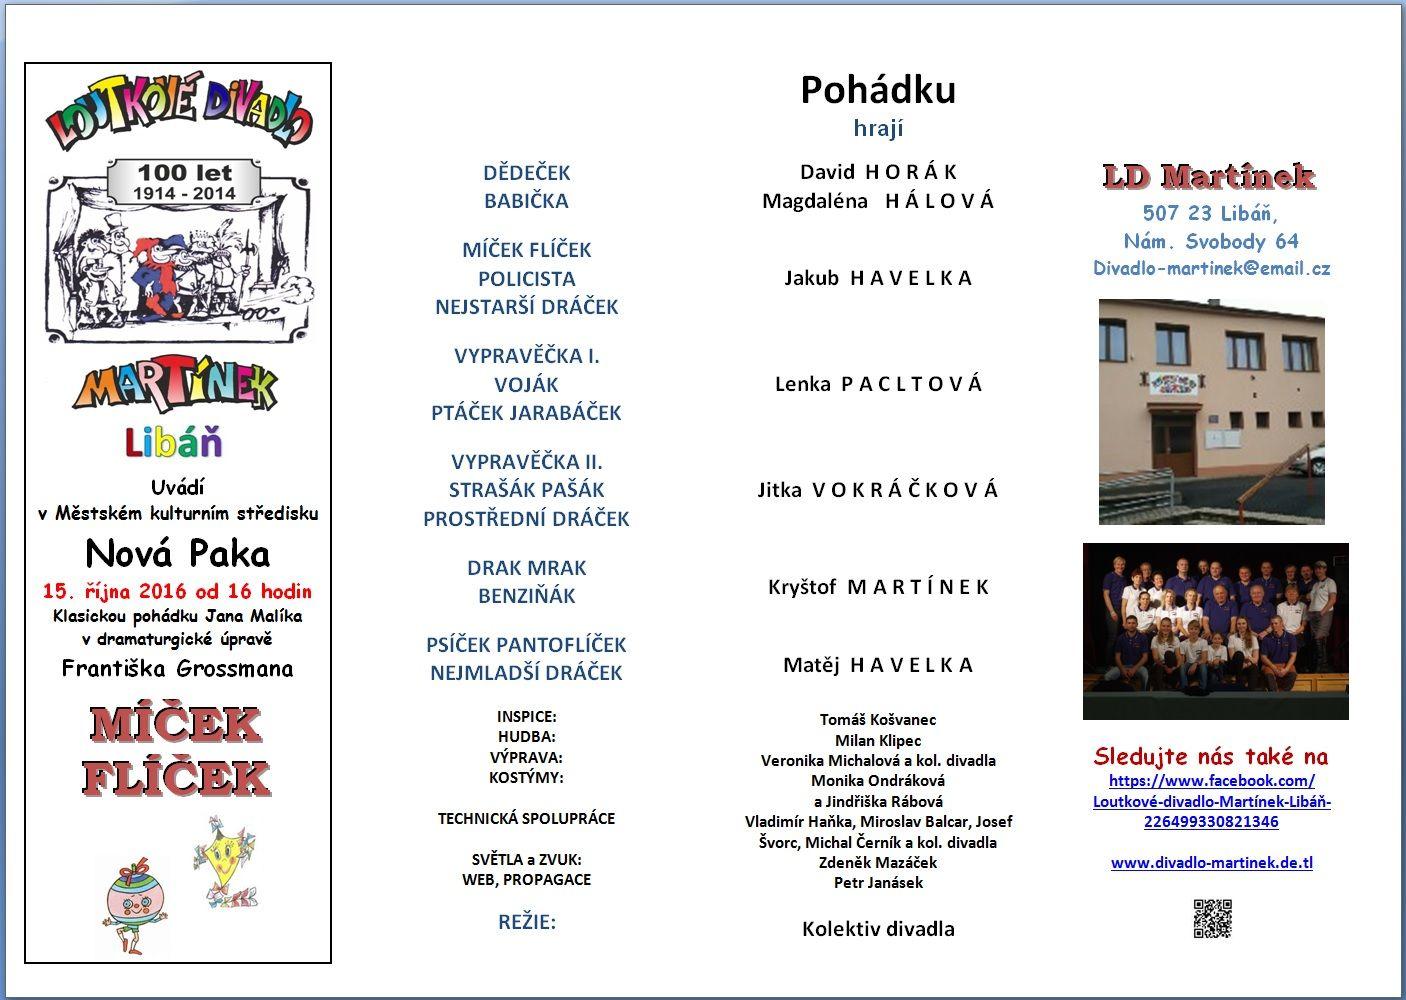 https://img.webme.com/pic/d/divadlo-martinek/MFNovaPaka2016.jpg